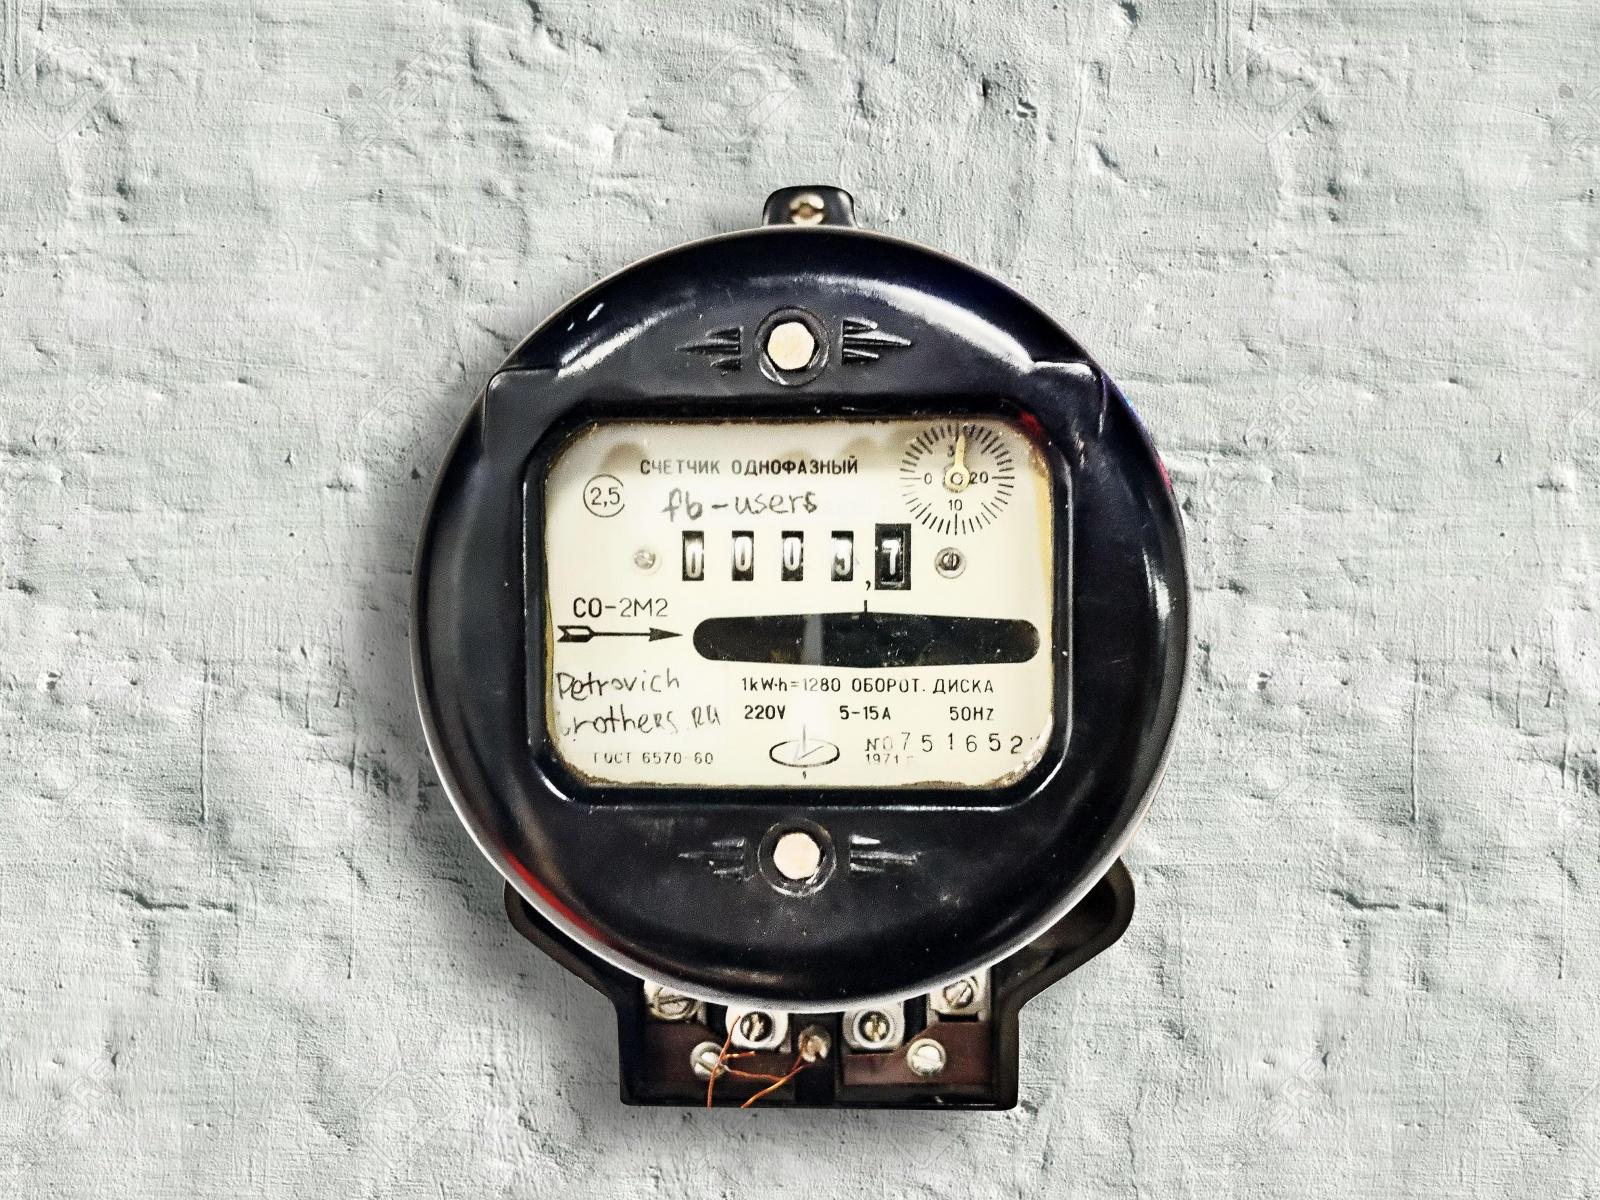 Счетчик Фейсбук-лайков из старого электросчетчика - 1